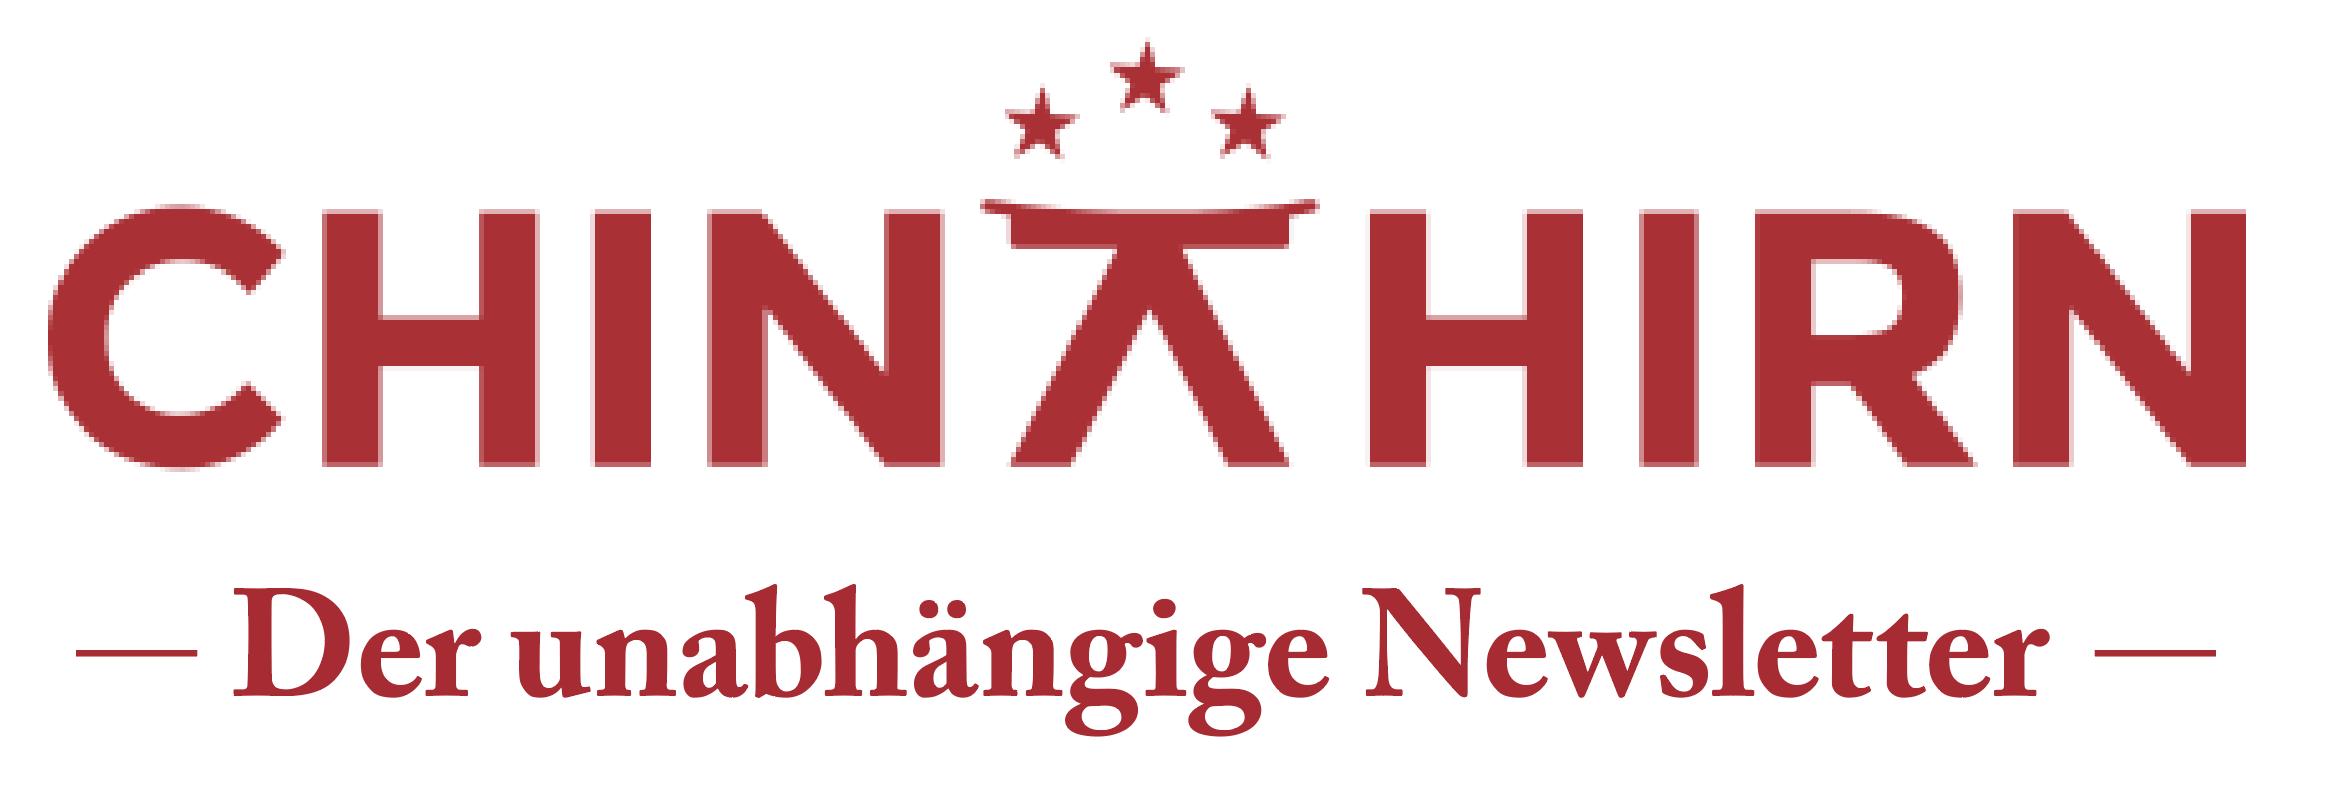 chinahirn unabh Newsletter header